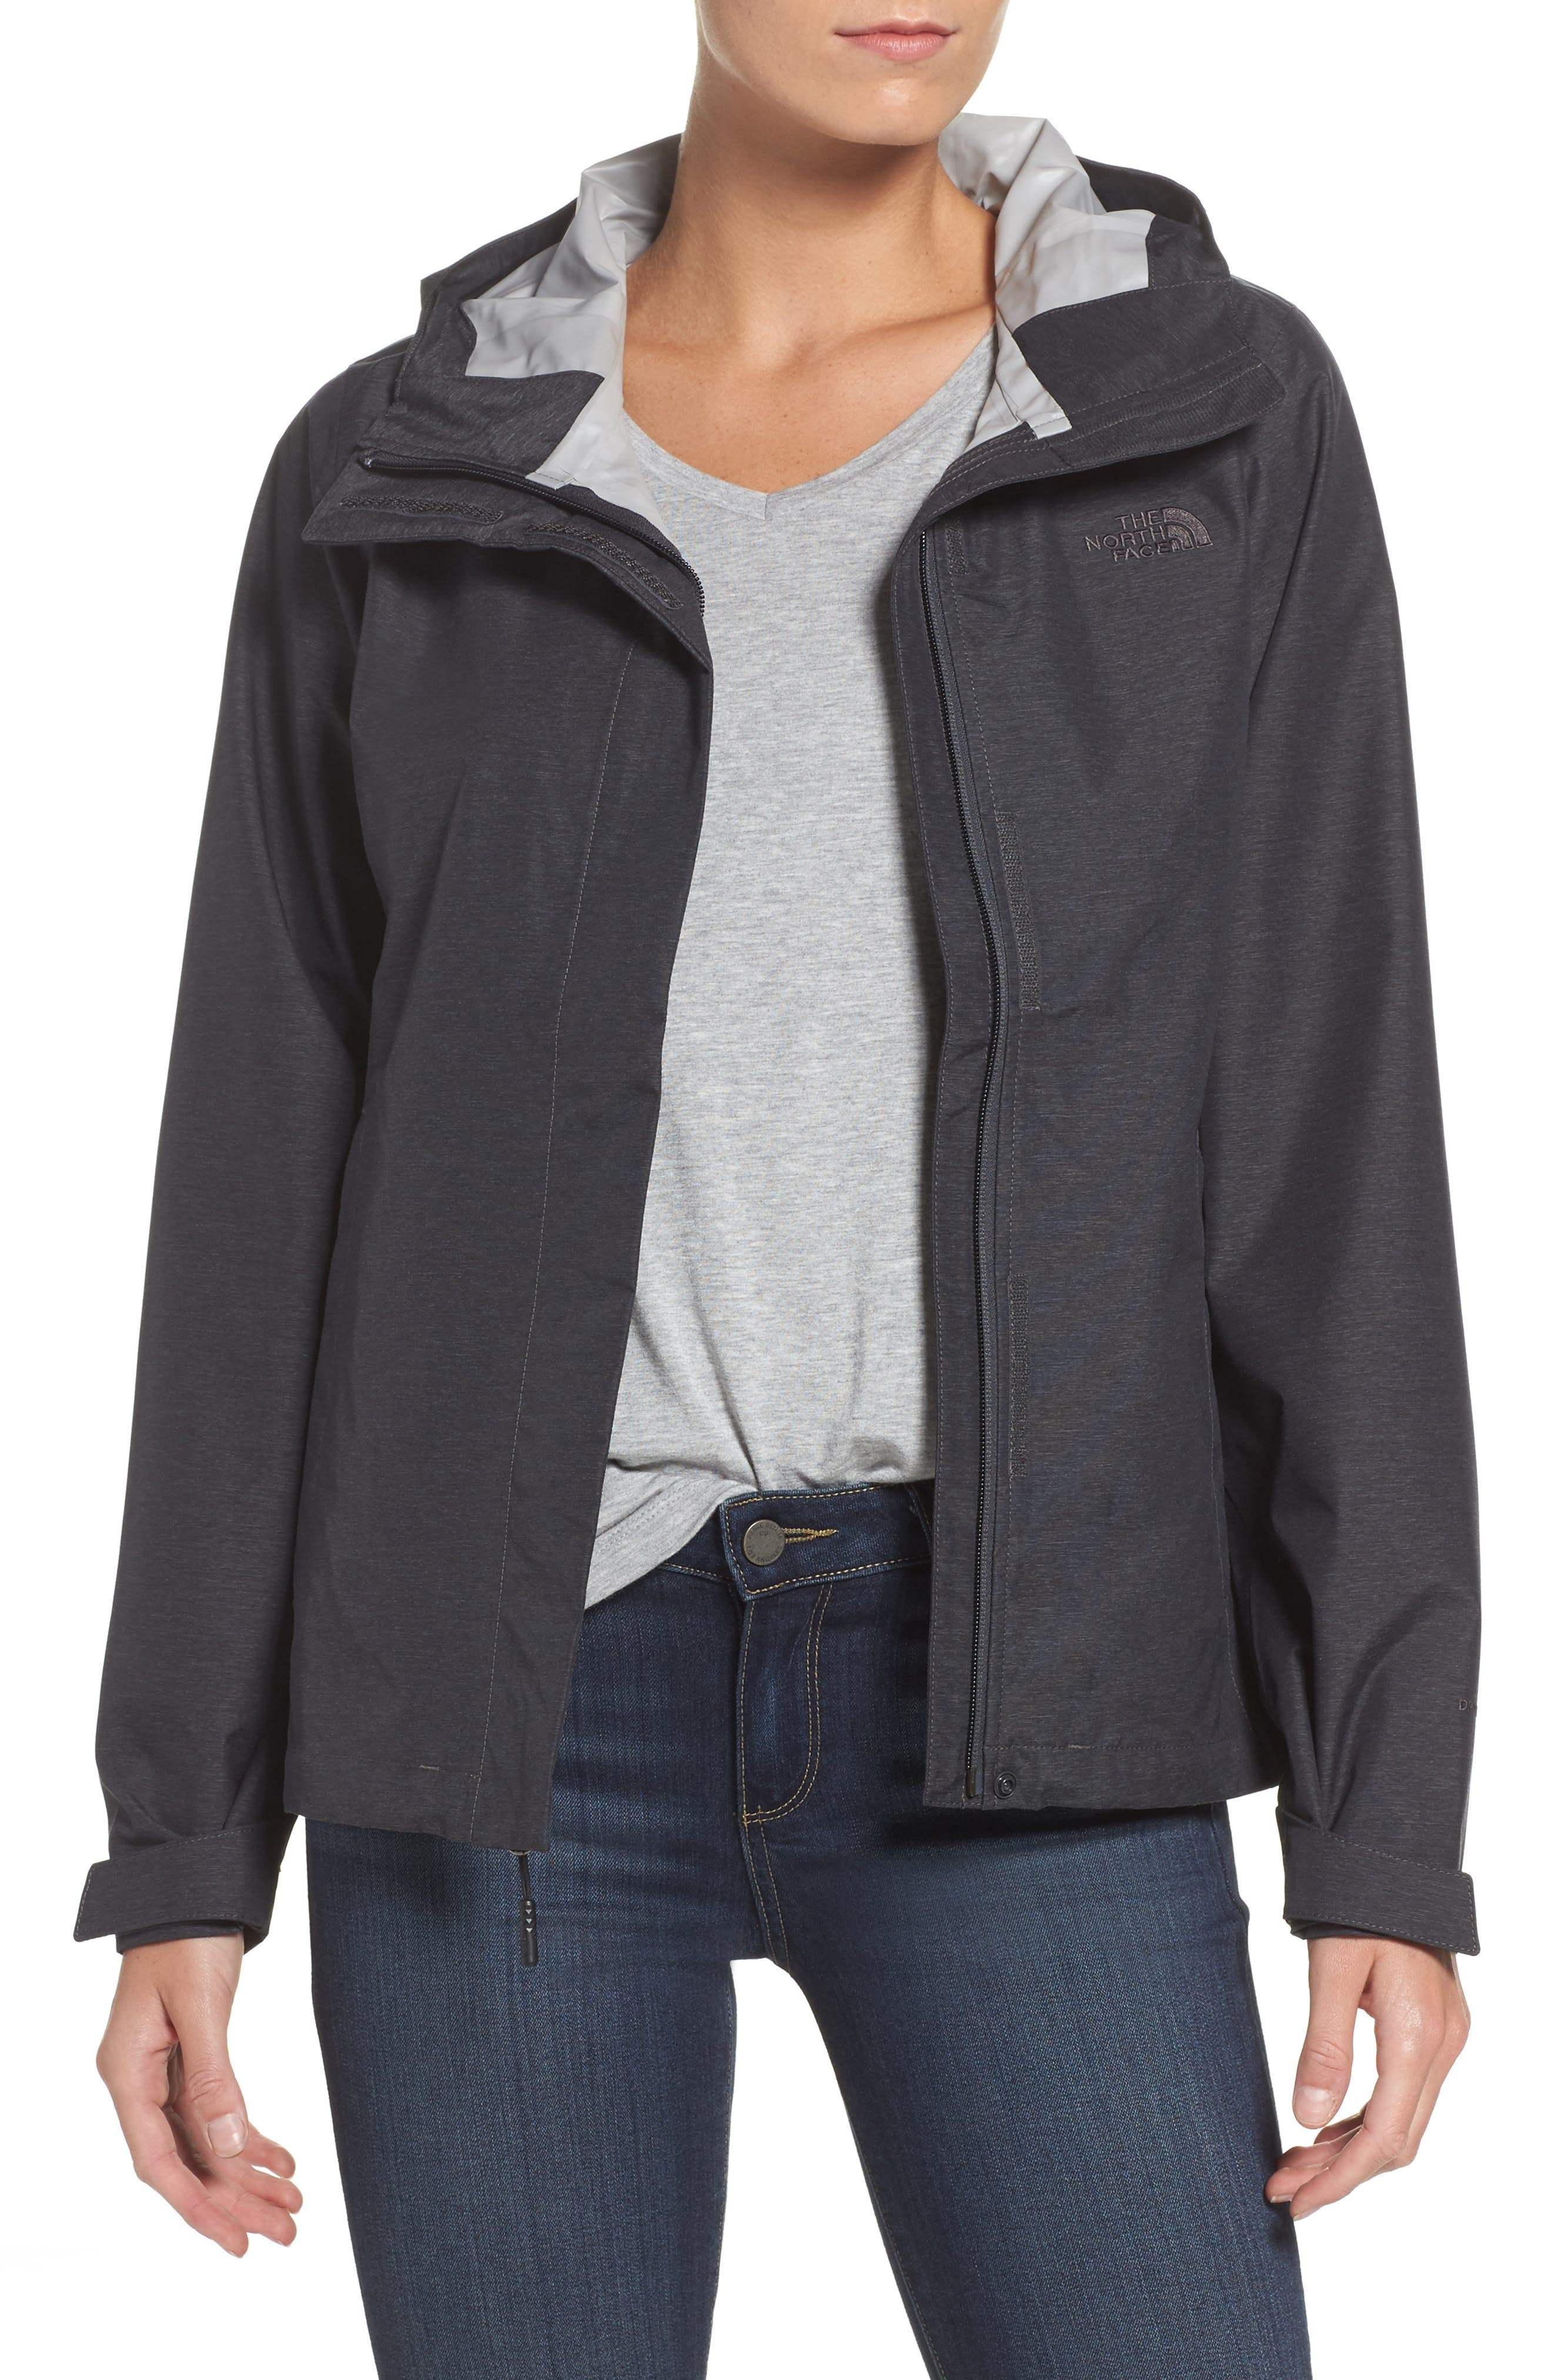 Venture 2 Waterproof Jacket,                             Main thumbnail 1, color,                             TNF DARK GREY HEATHER